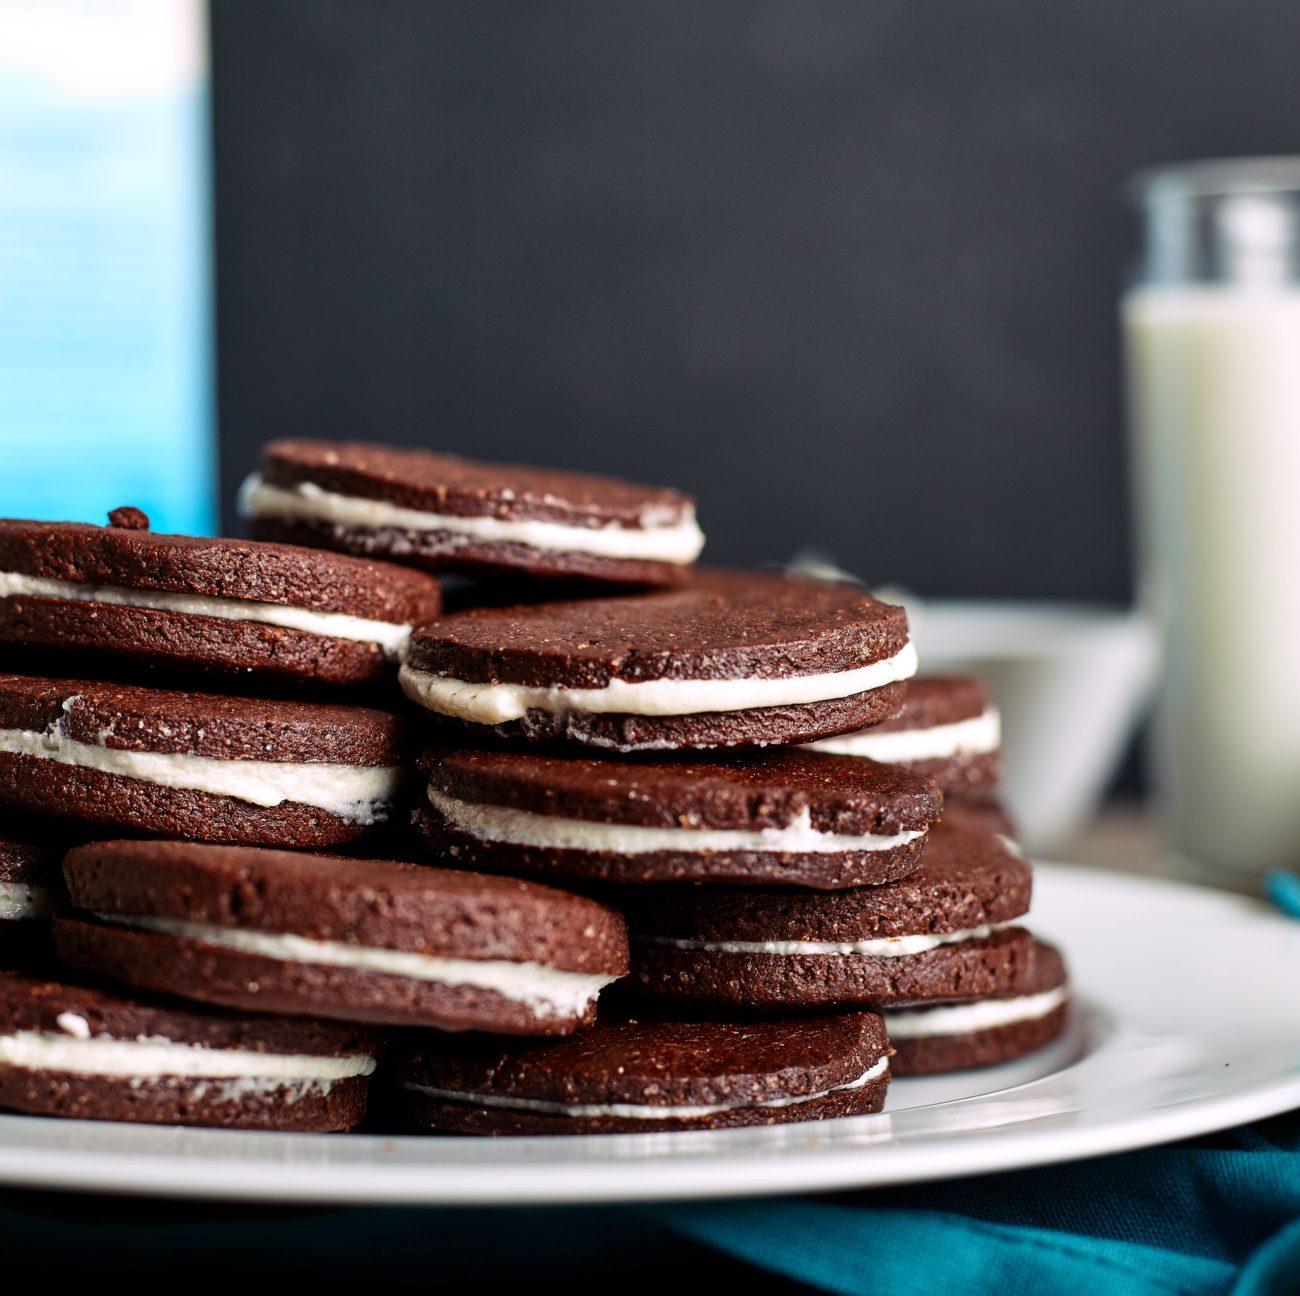 Schokocreme-Kekse